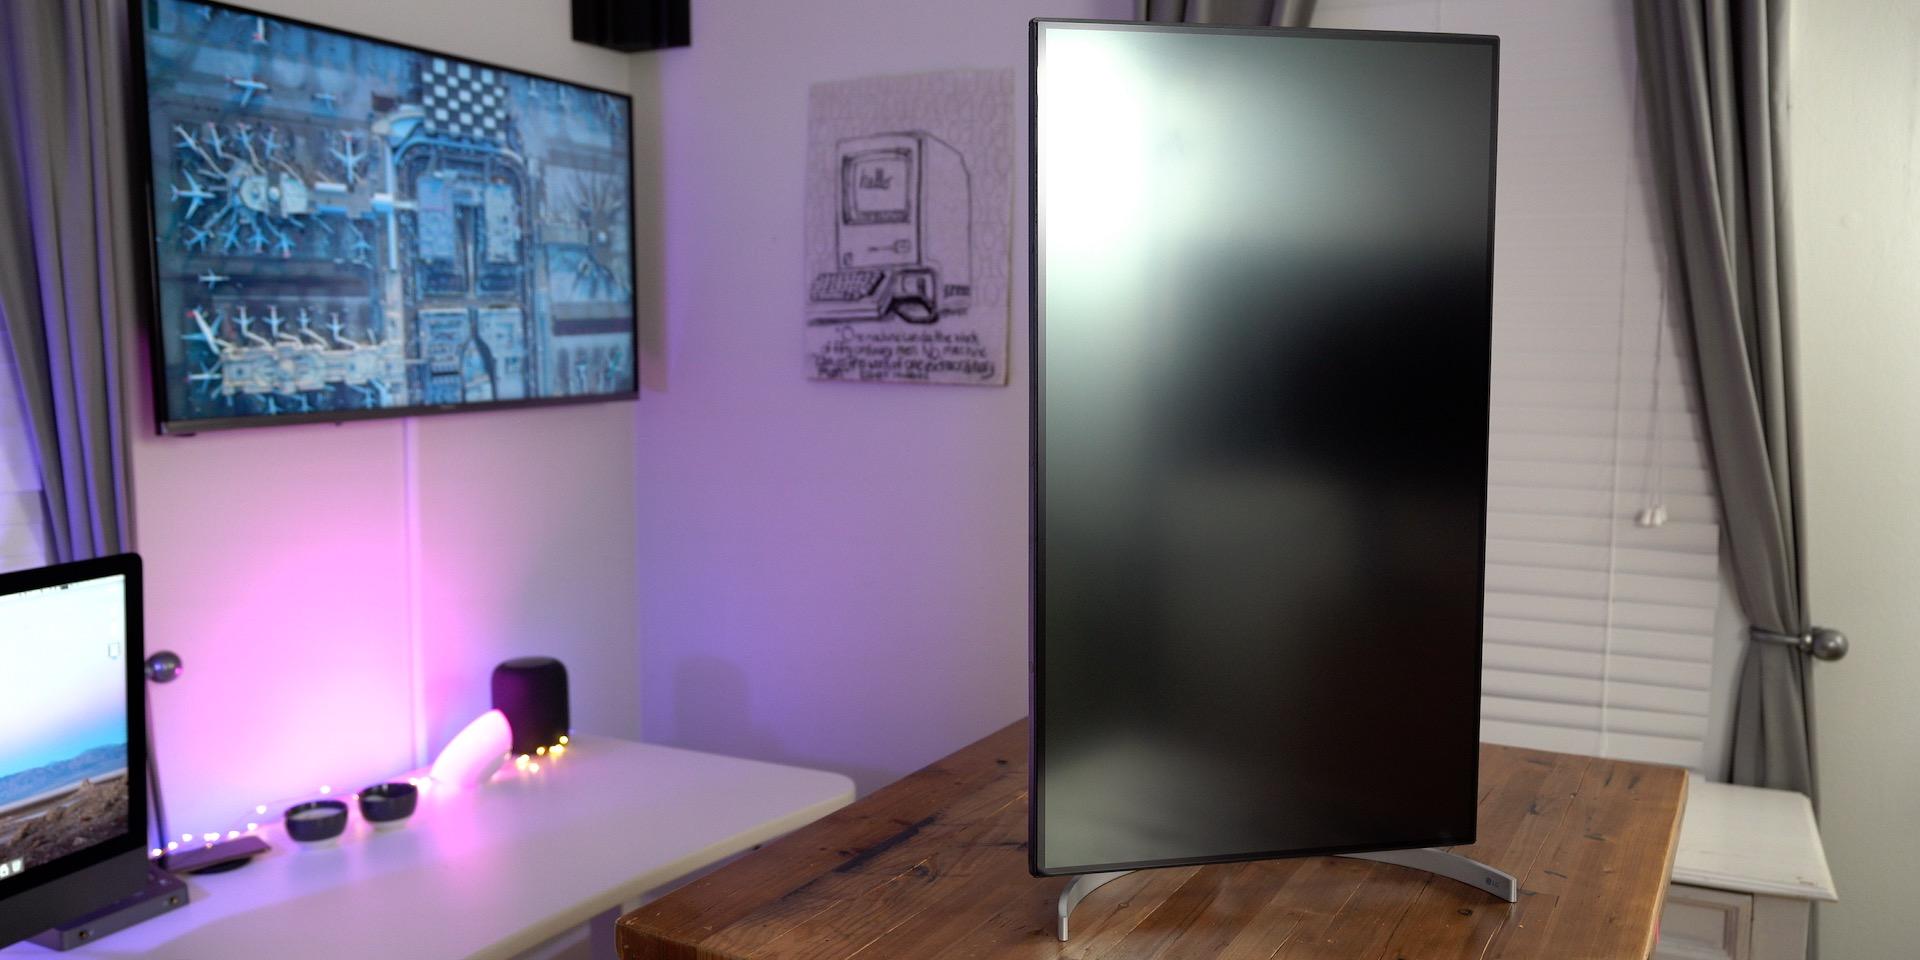 LG 32UL950 UltraFine 4K Display Review Vertical